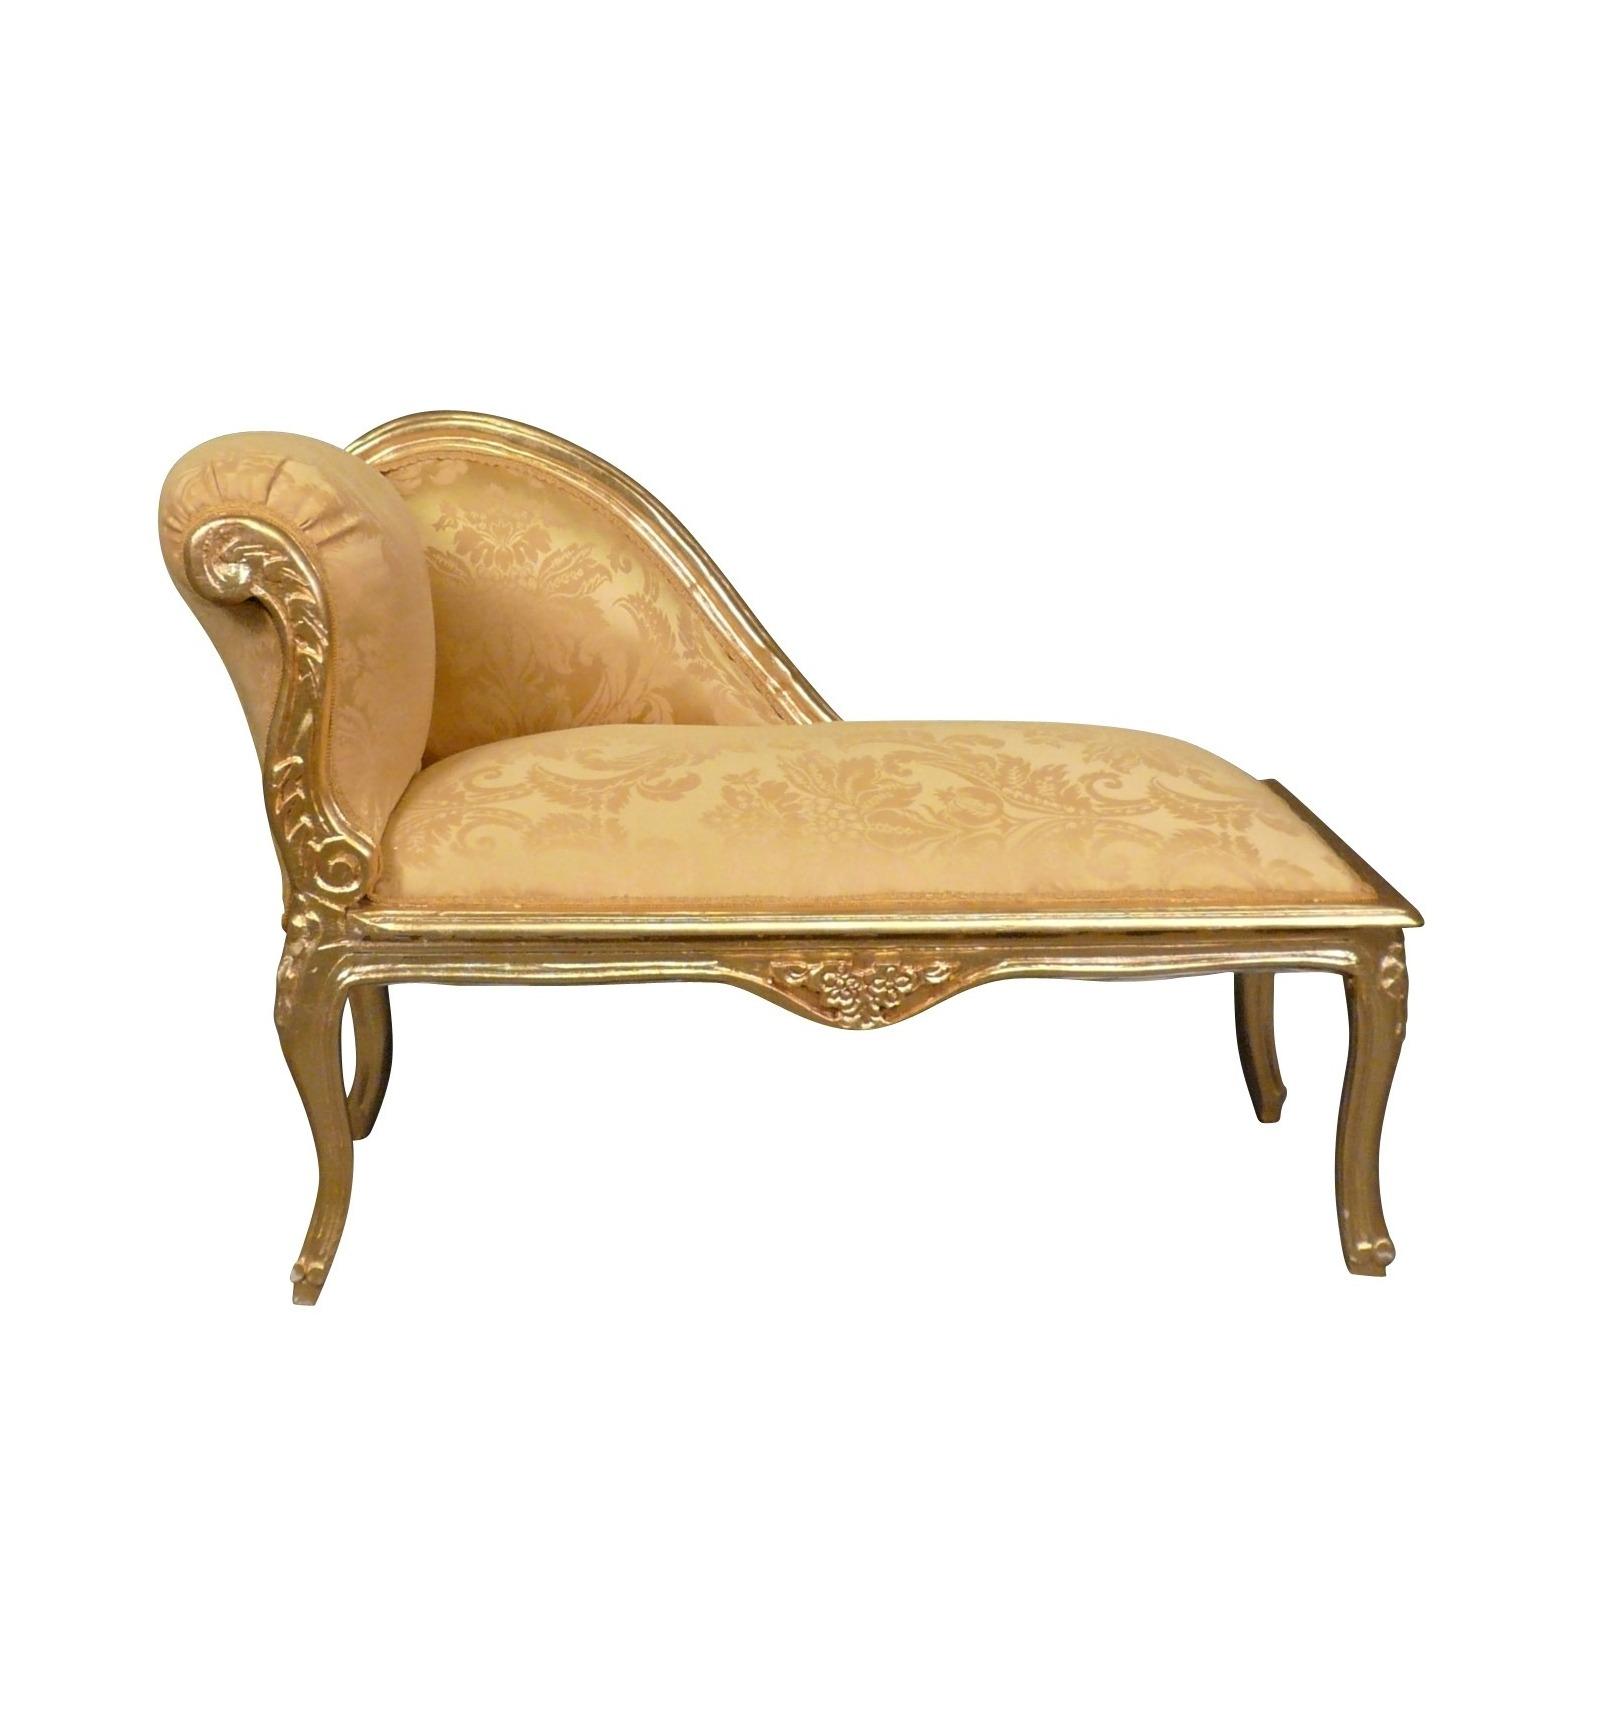 Chaise longue barocco  Poltrona Louis XV